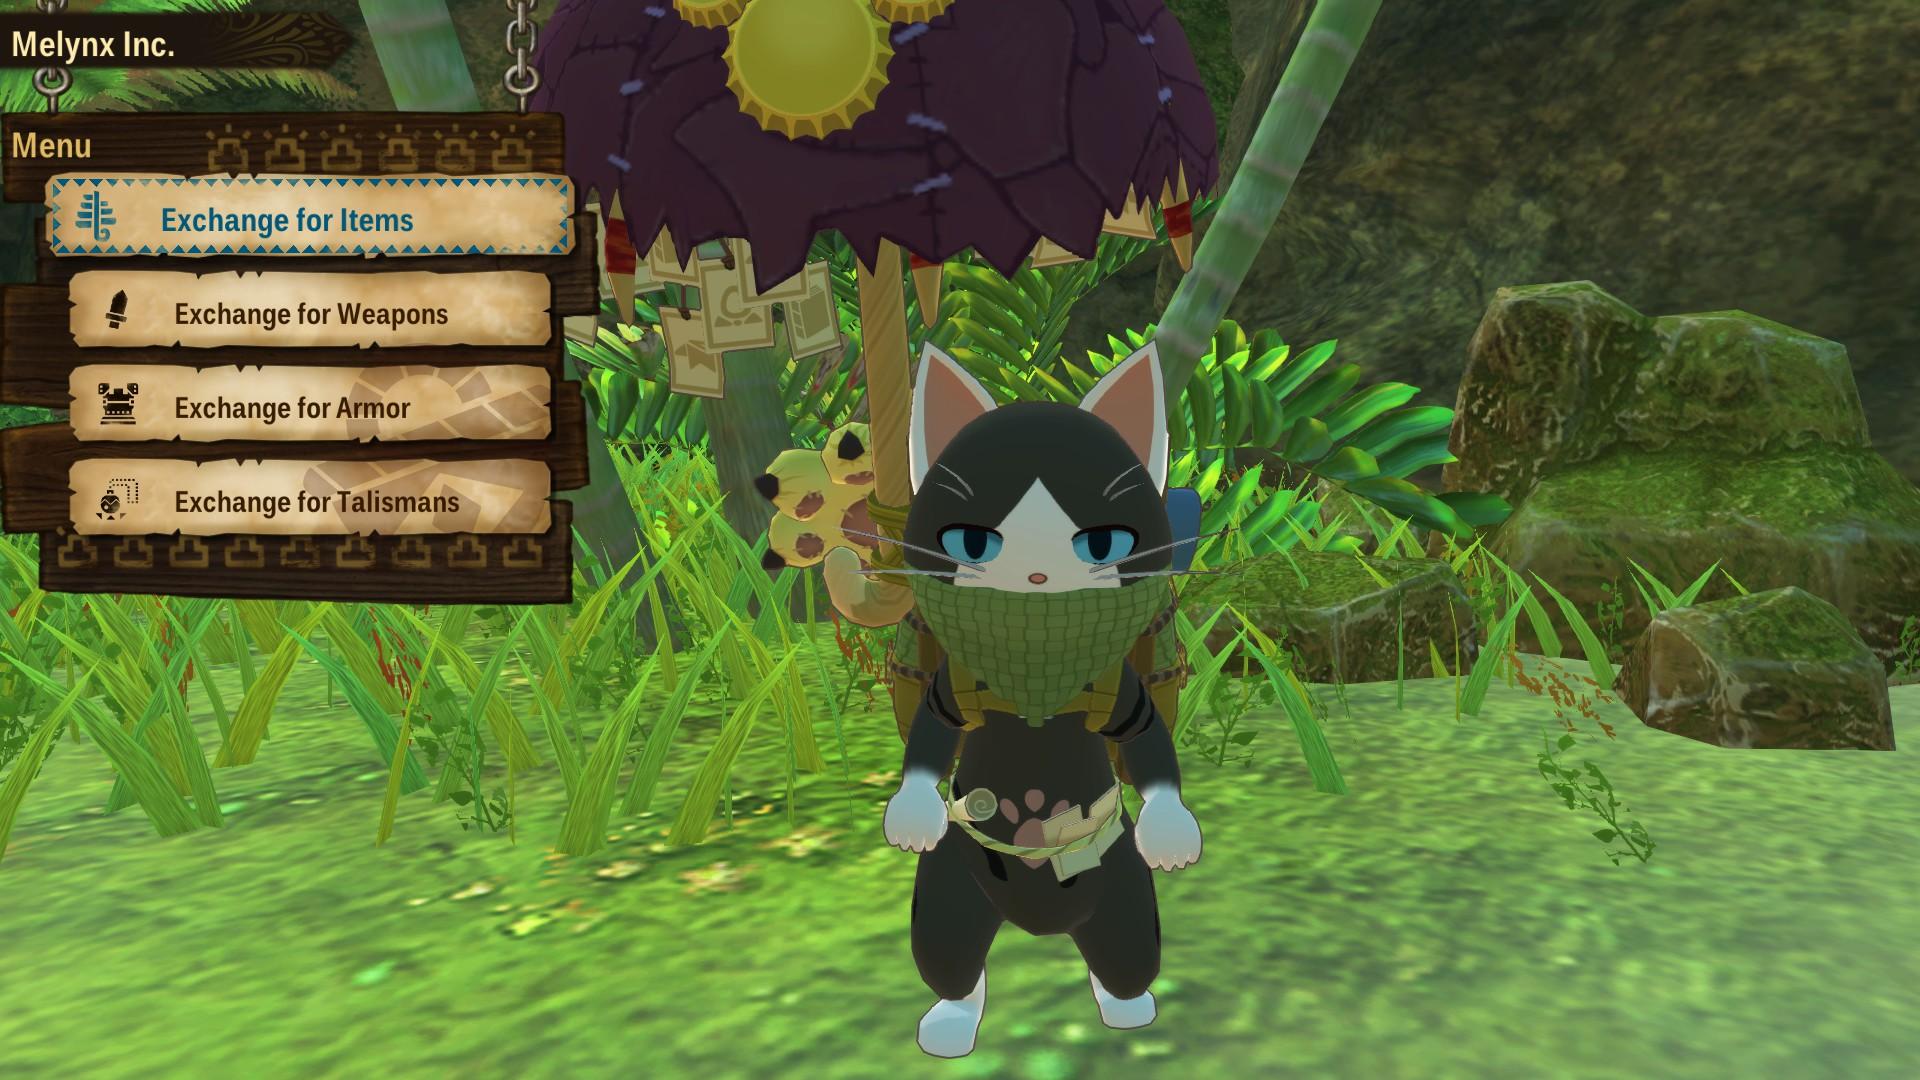 Monster Hunter Stories 2: Melynx Inc. Shop Locations   RPG Site